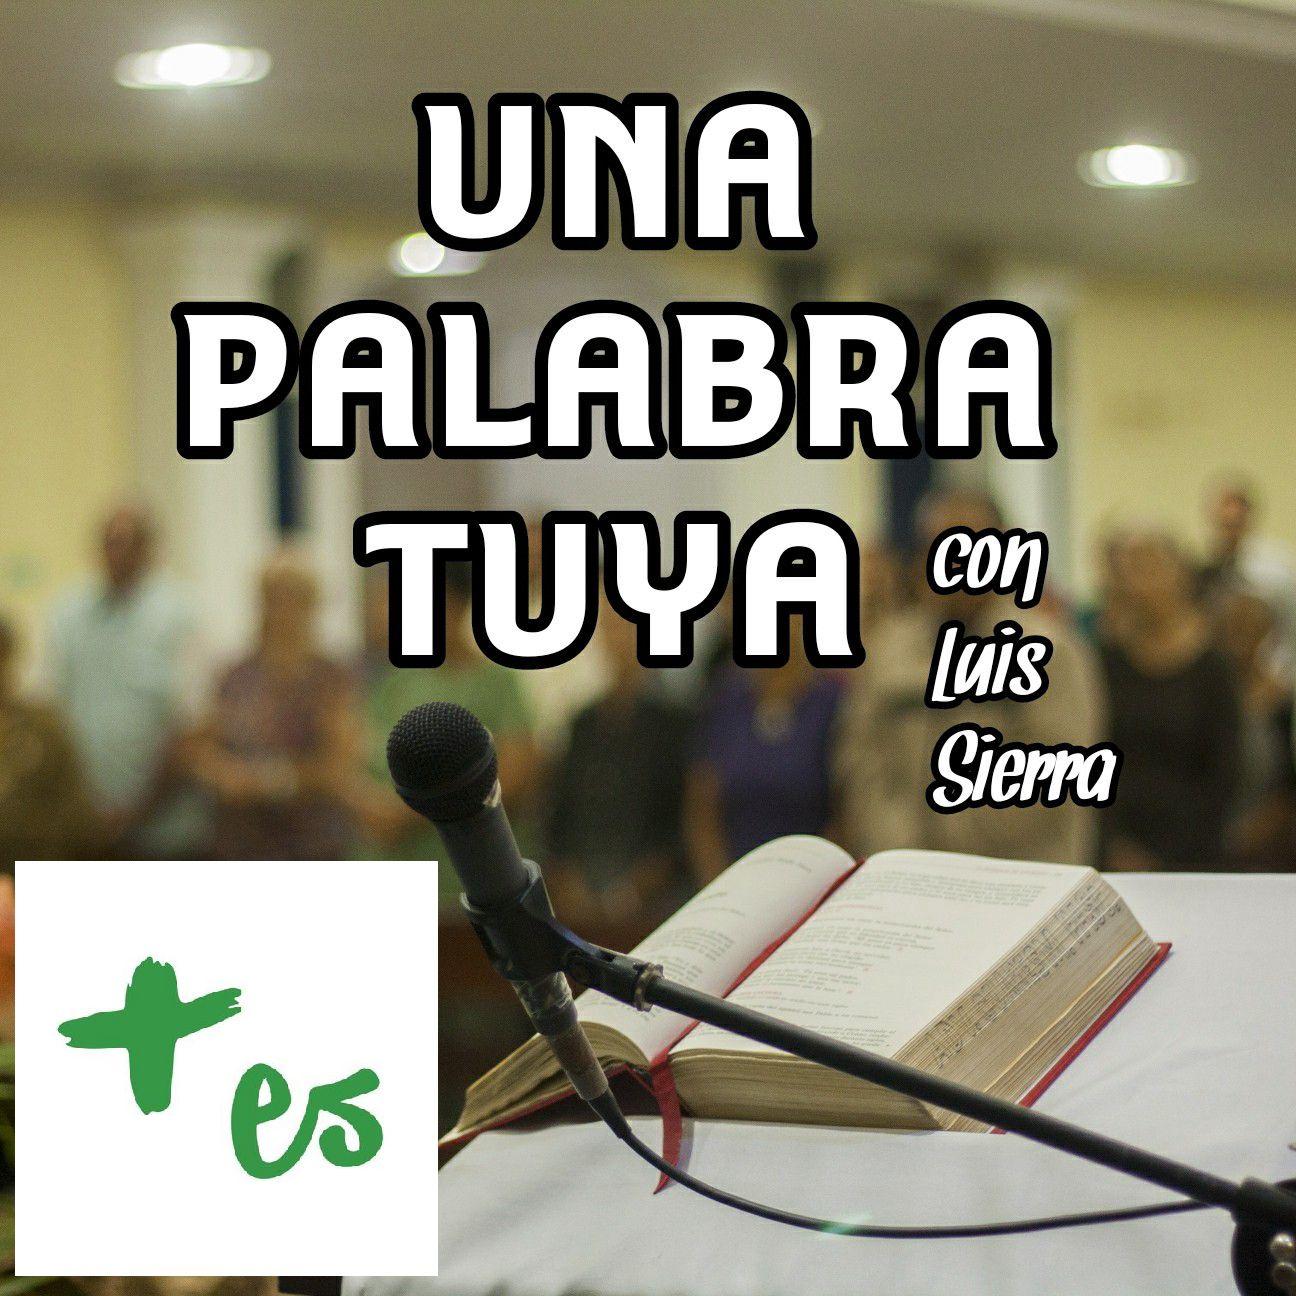 Una Palabra Tuya | 6 JUN 2019